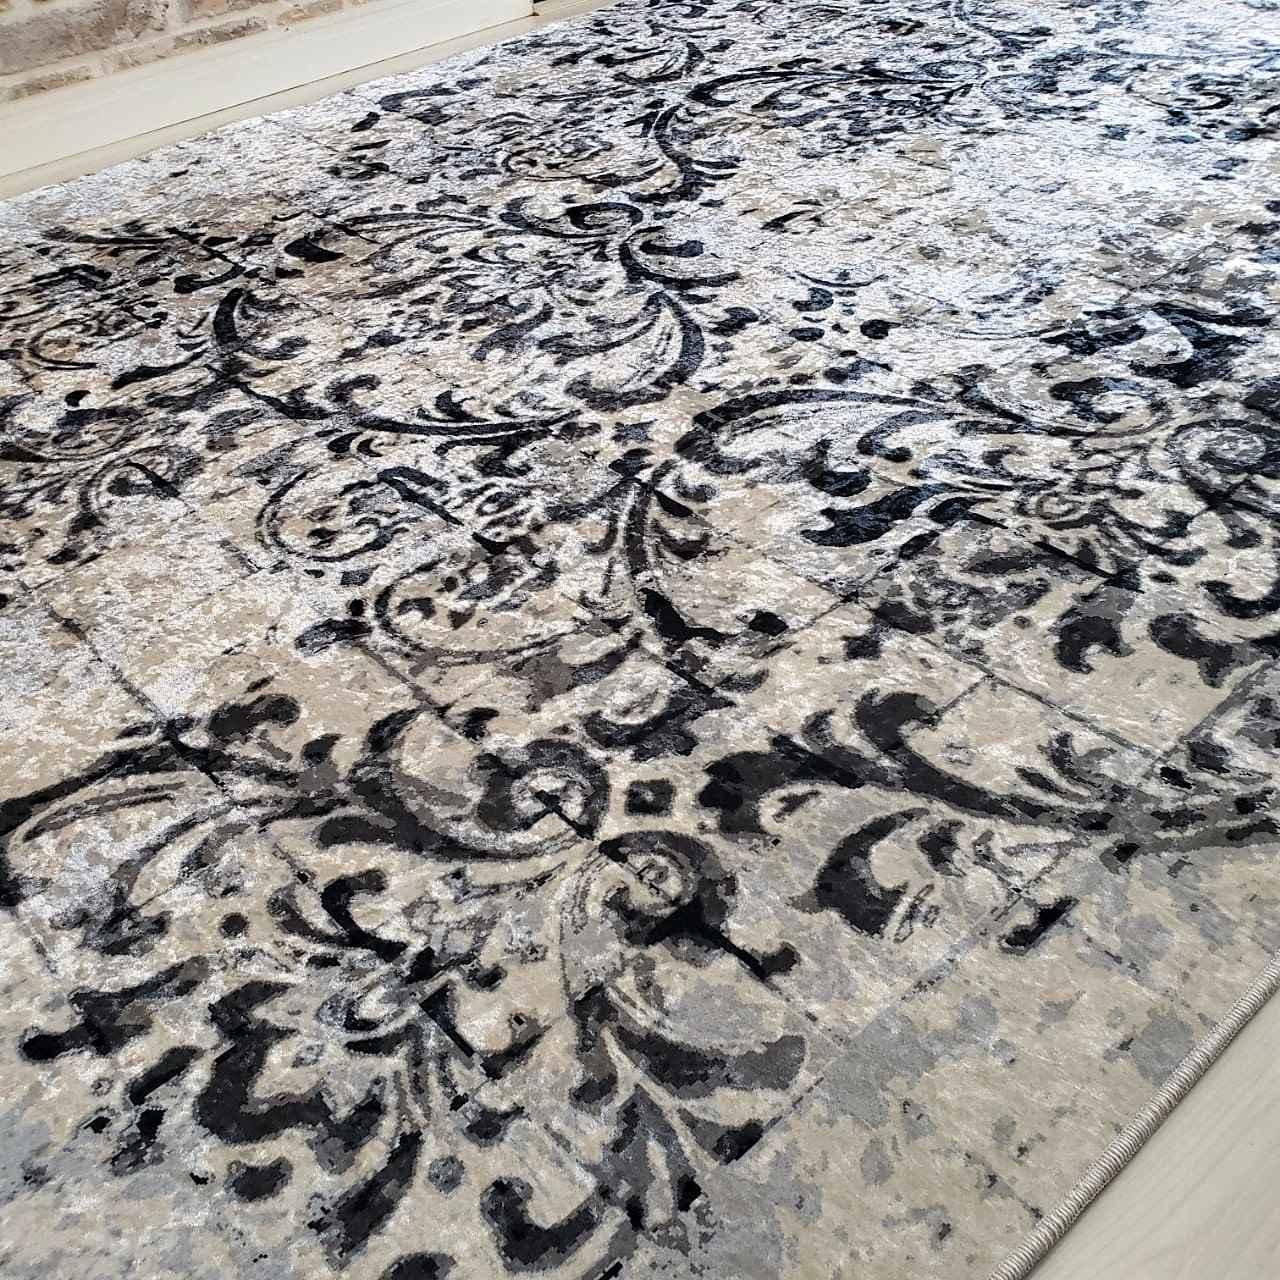 Tapete Importado Art Paint Estampado 1,50x2,00m GREY & BLACK JZ355